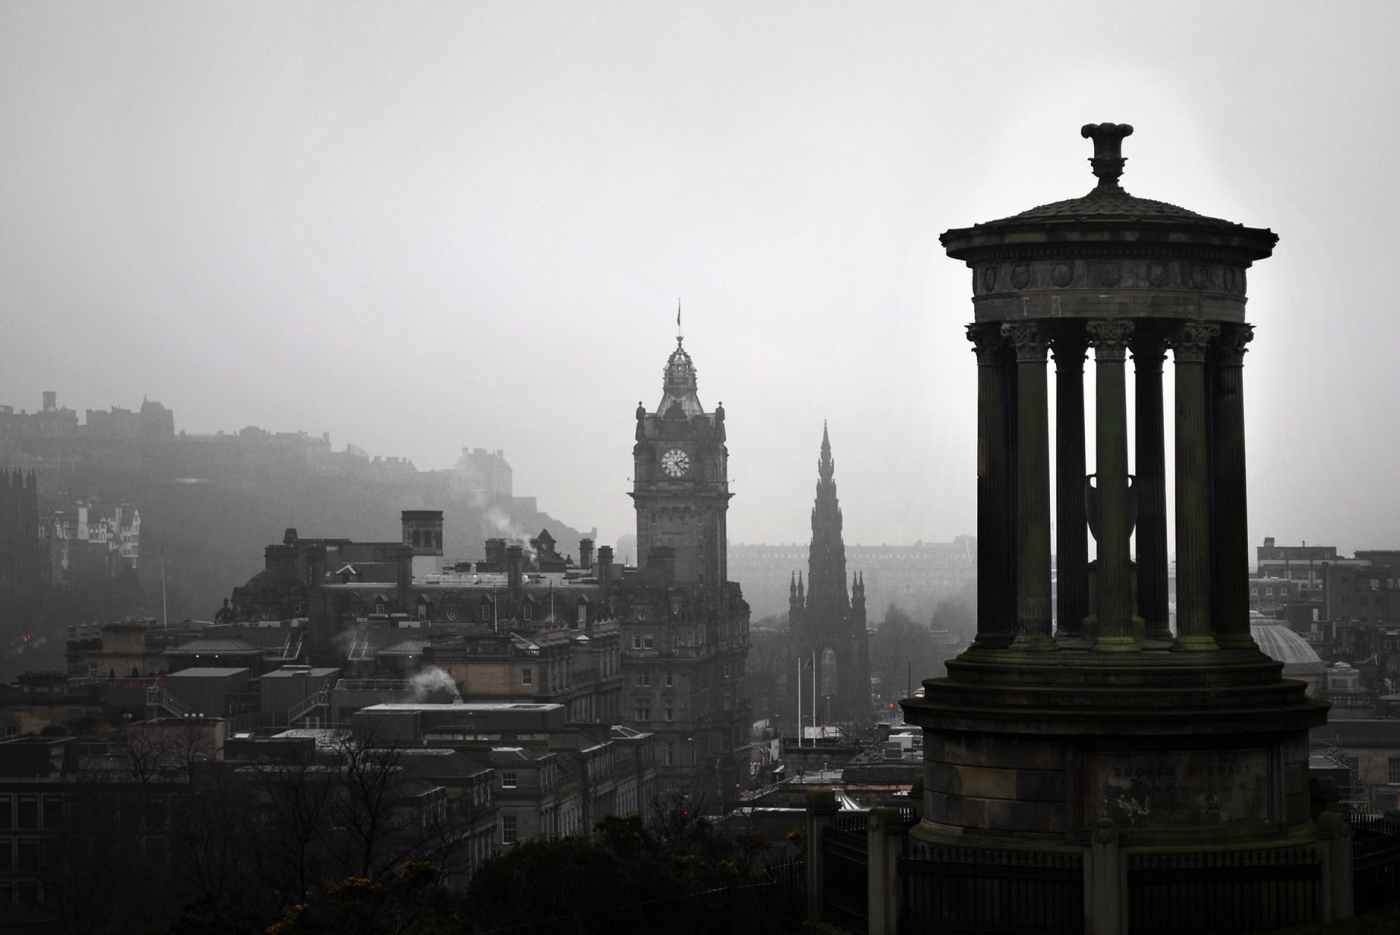 Edinburgh. Calton Hill. Scottish Parliamentary Culture Committee